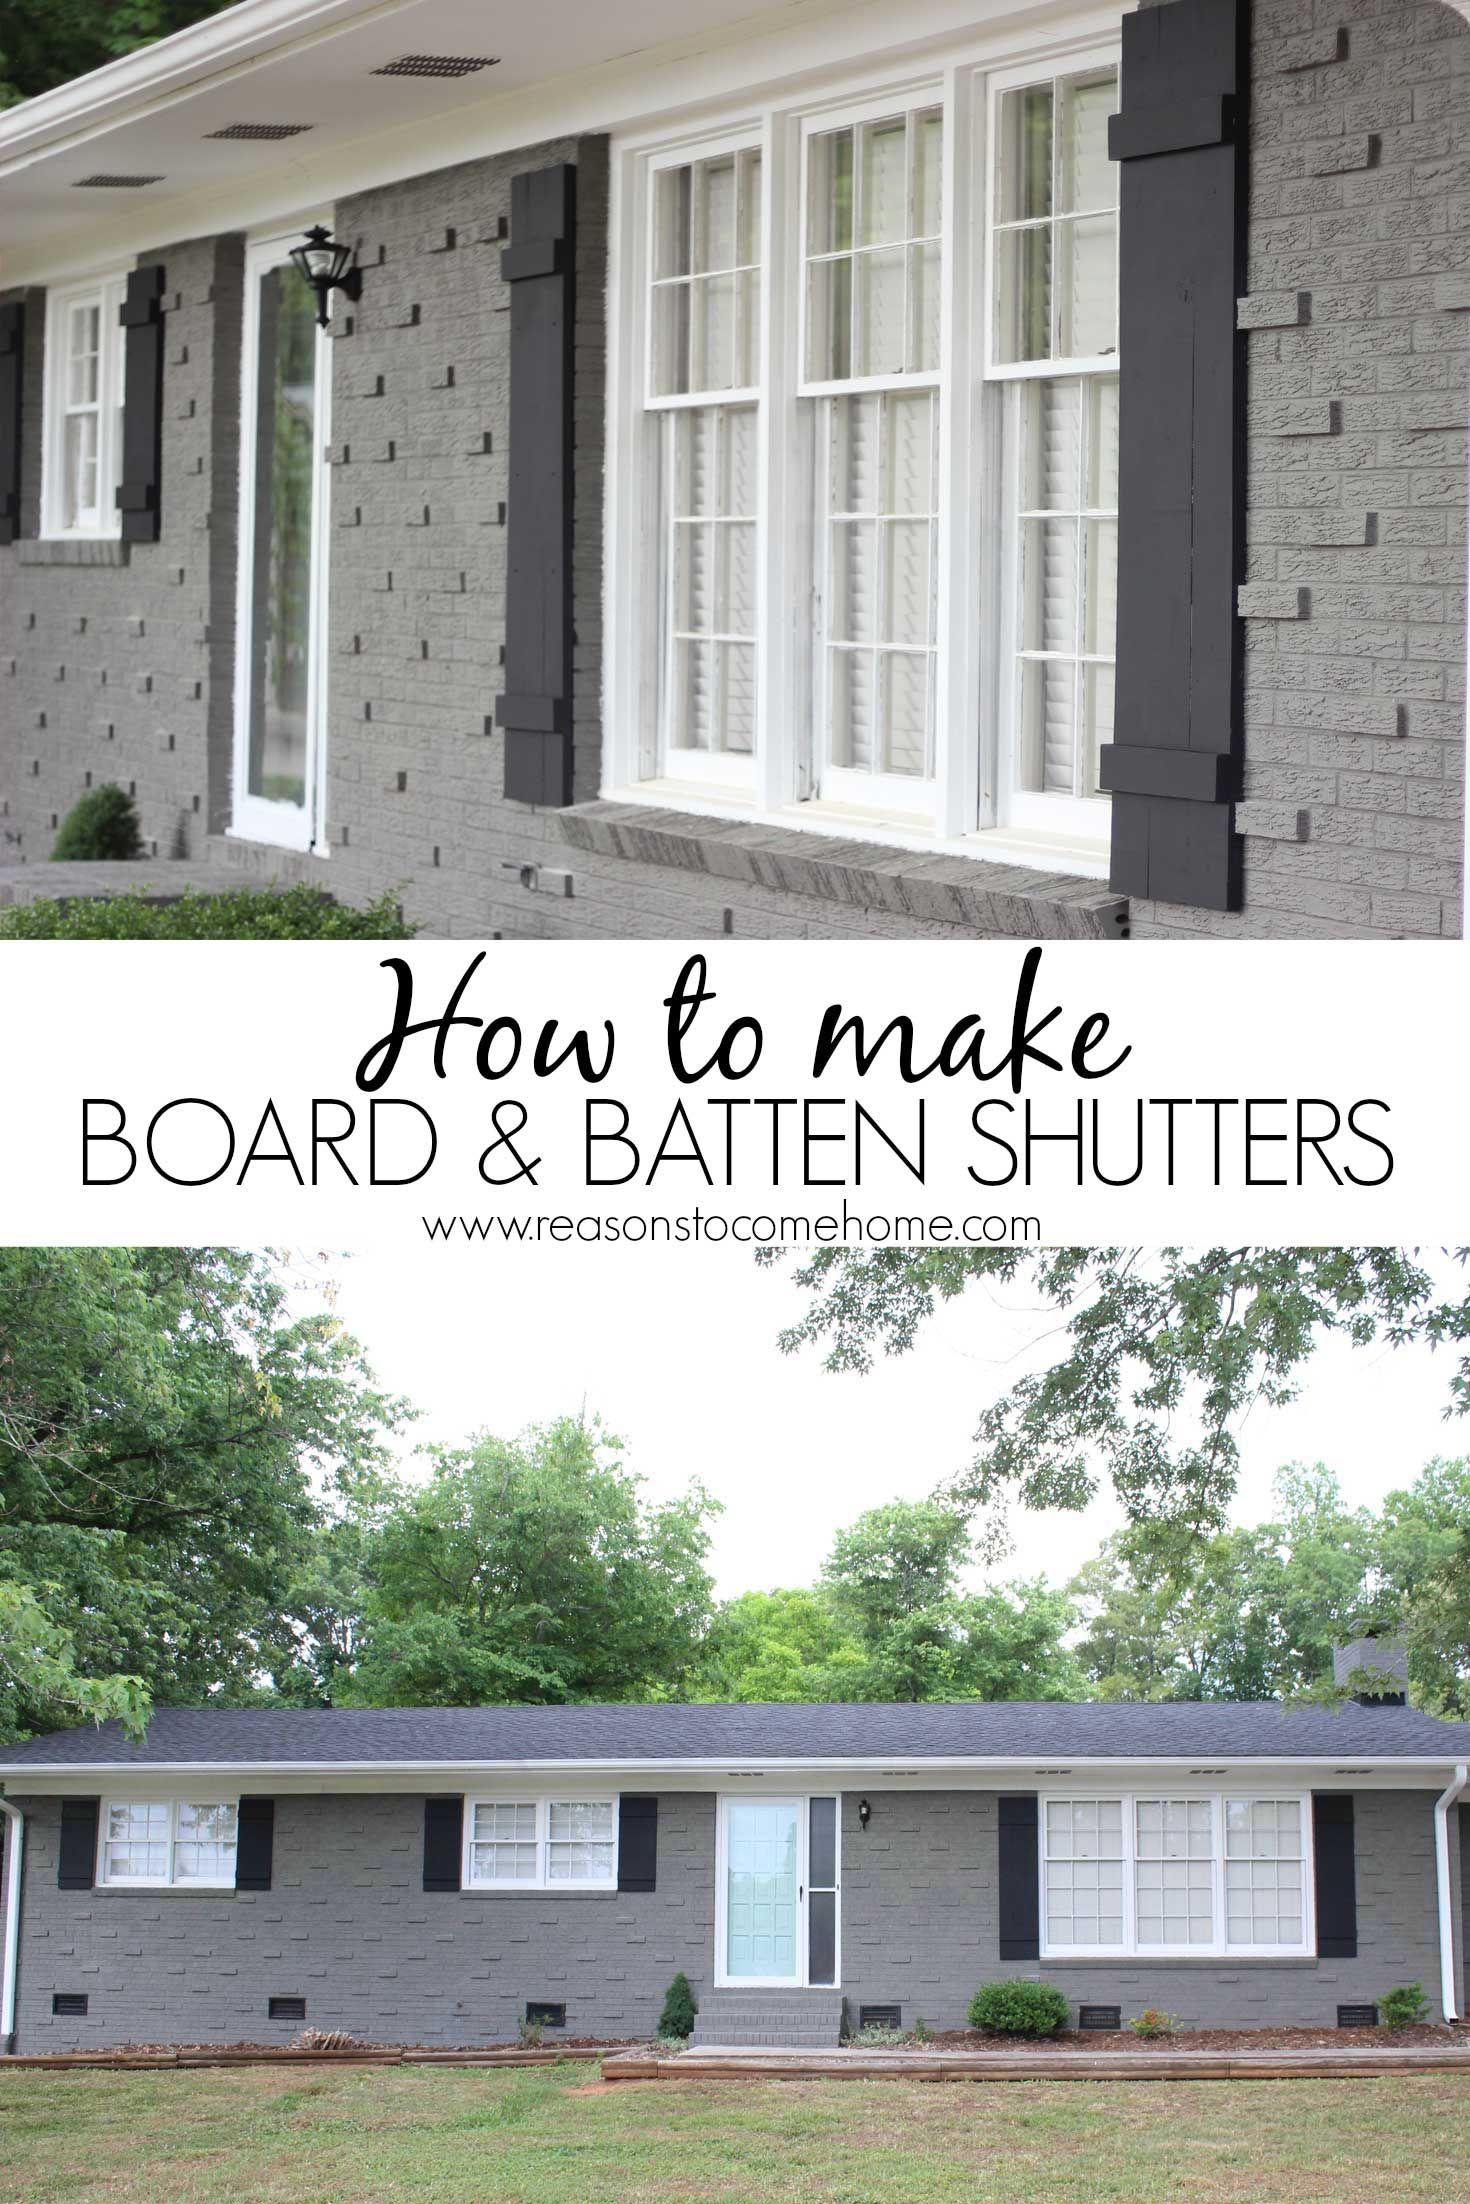 Diy Board And Batten Shutters Crafts Diy Repurposing Board Batten Shutters Diy Shutters Home